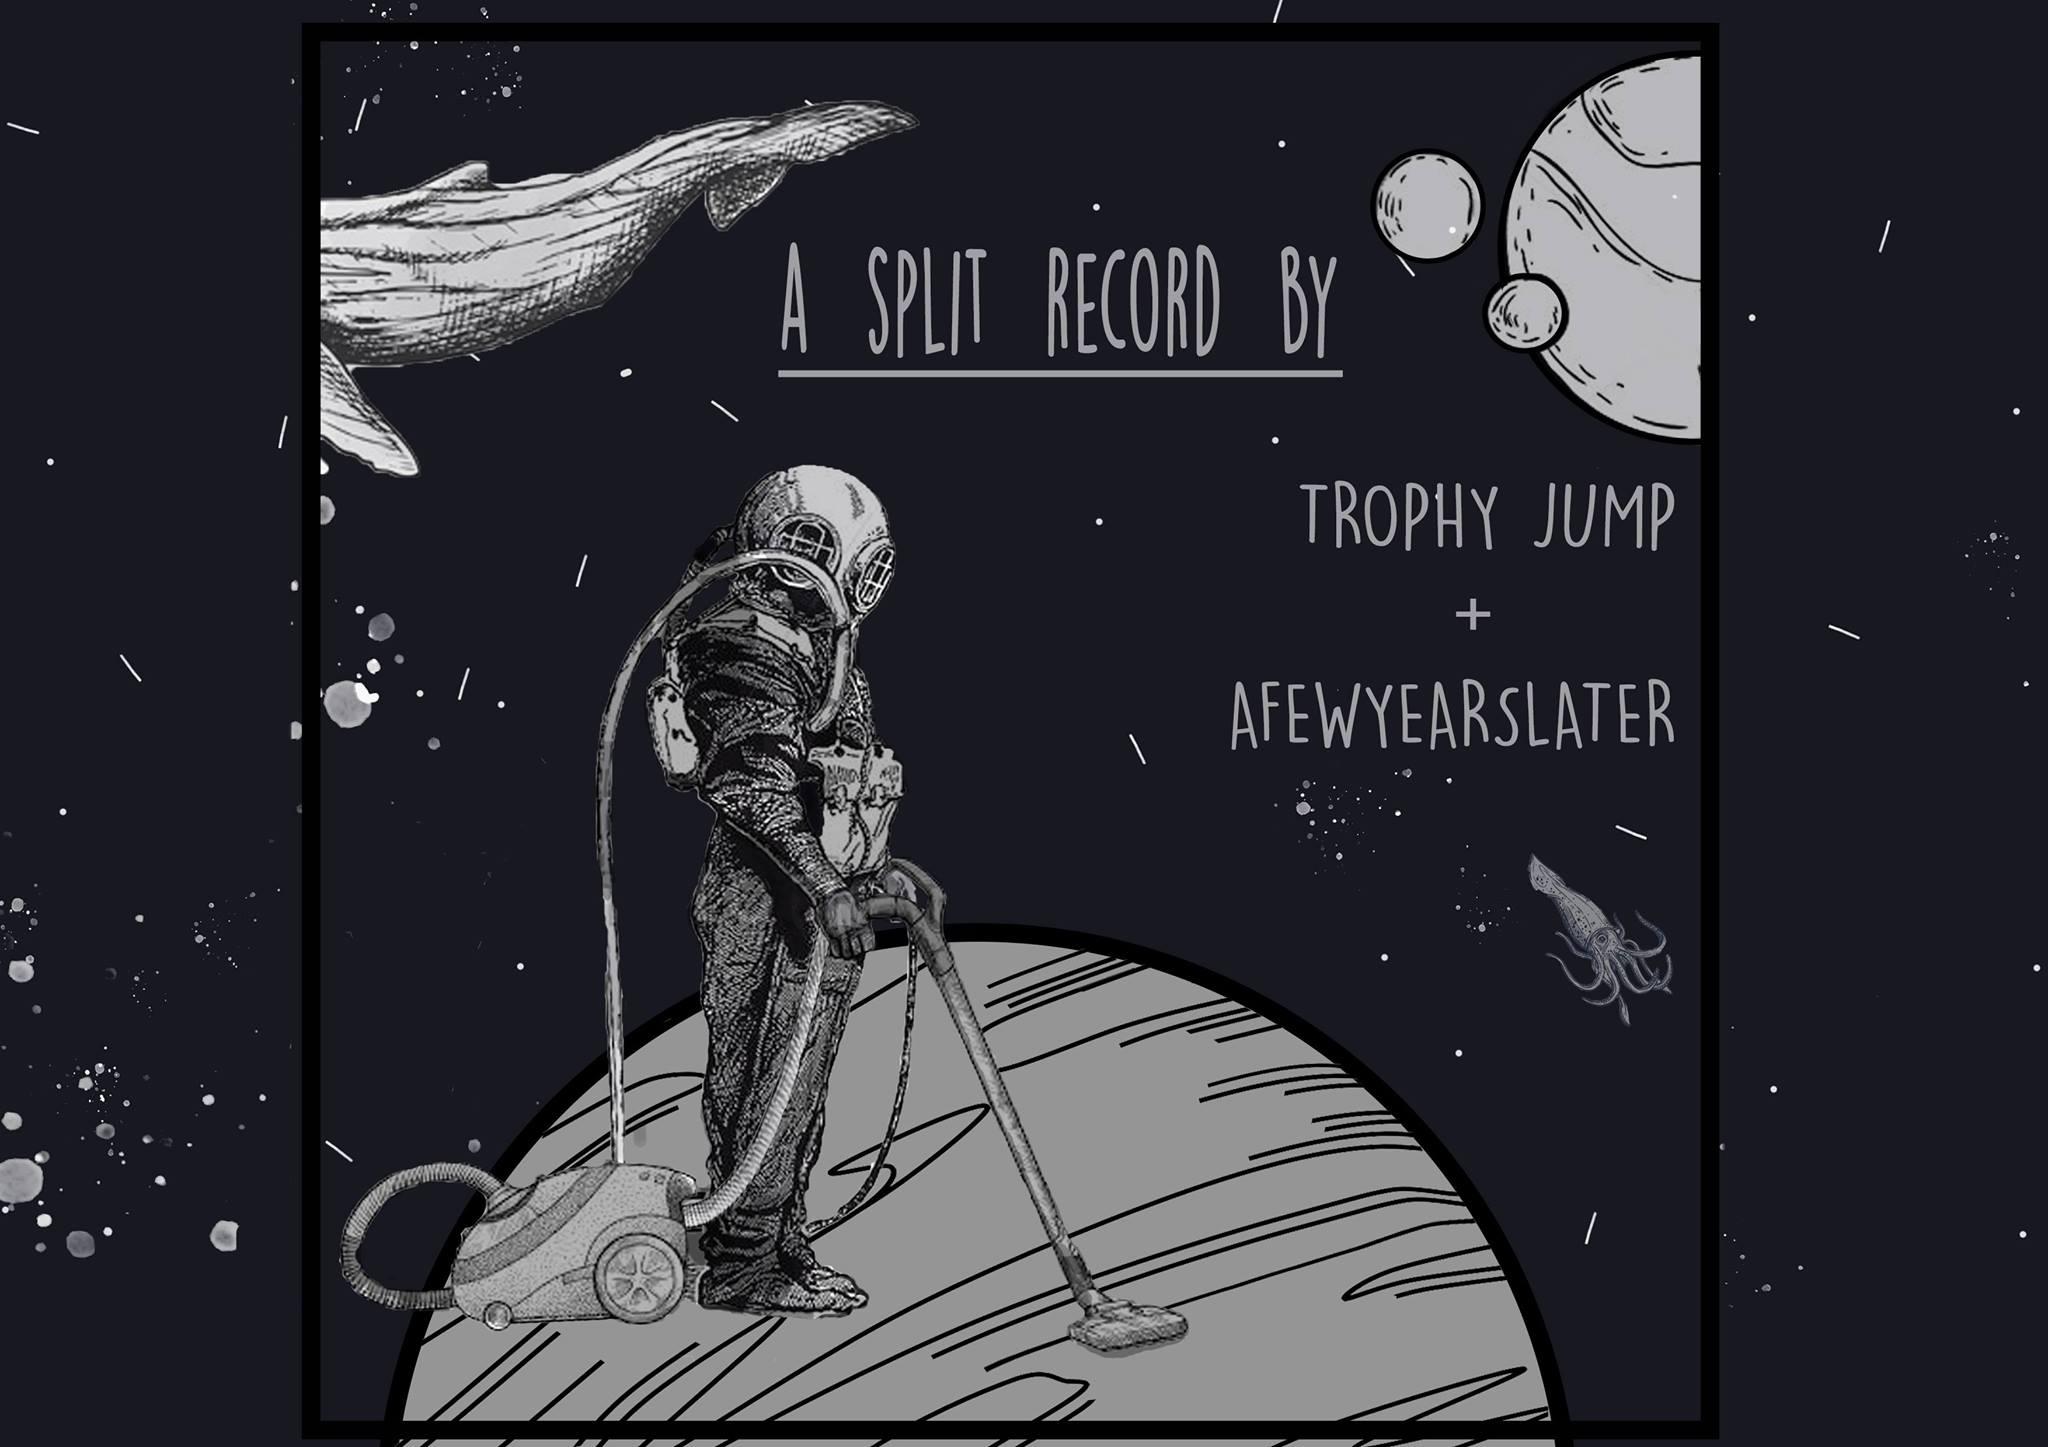 Trophy Jump